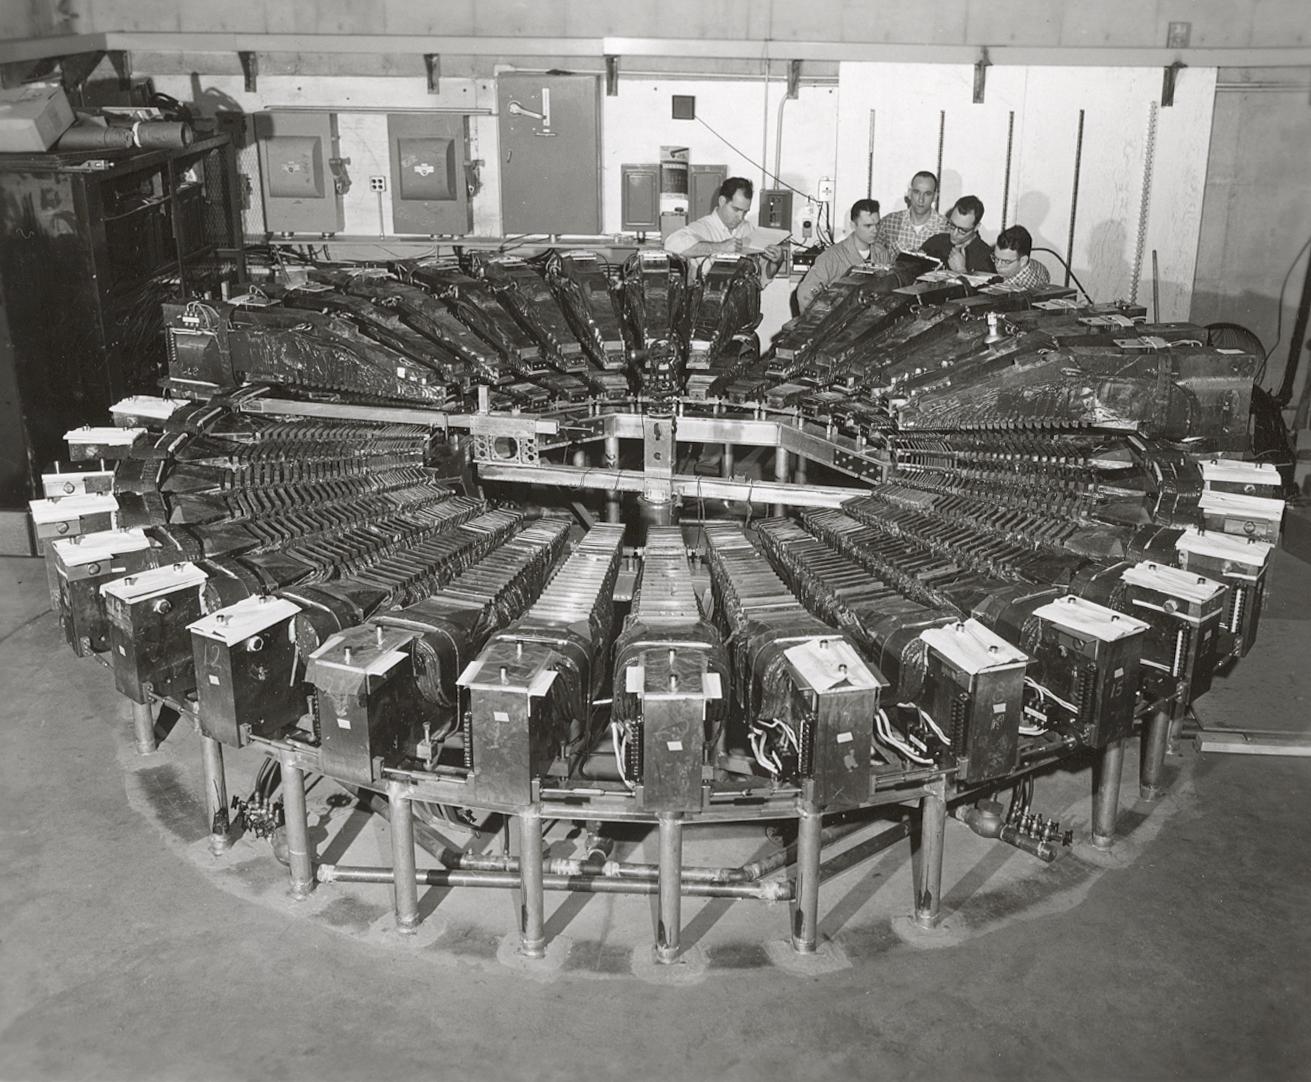 50 MeV machine on site at Midwestern Universities Research Association (MURA). Hugh Thornton, Carl Bauman, and Charlie Pratt. Photo: University of Wisconsin Madison Archives